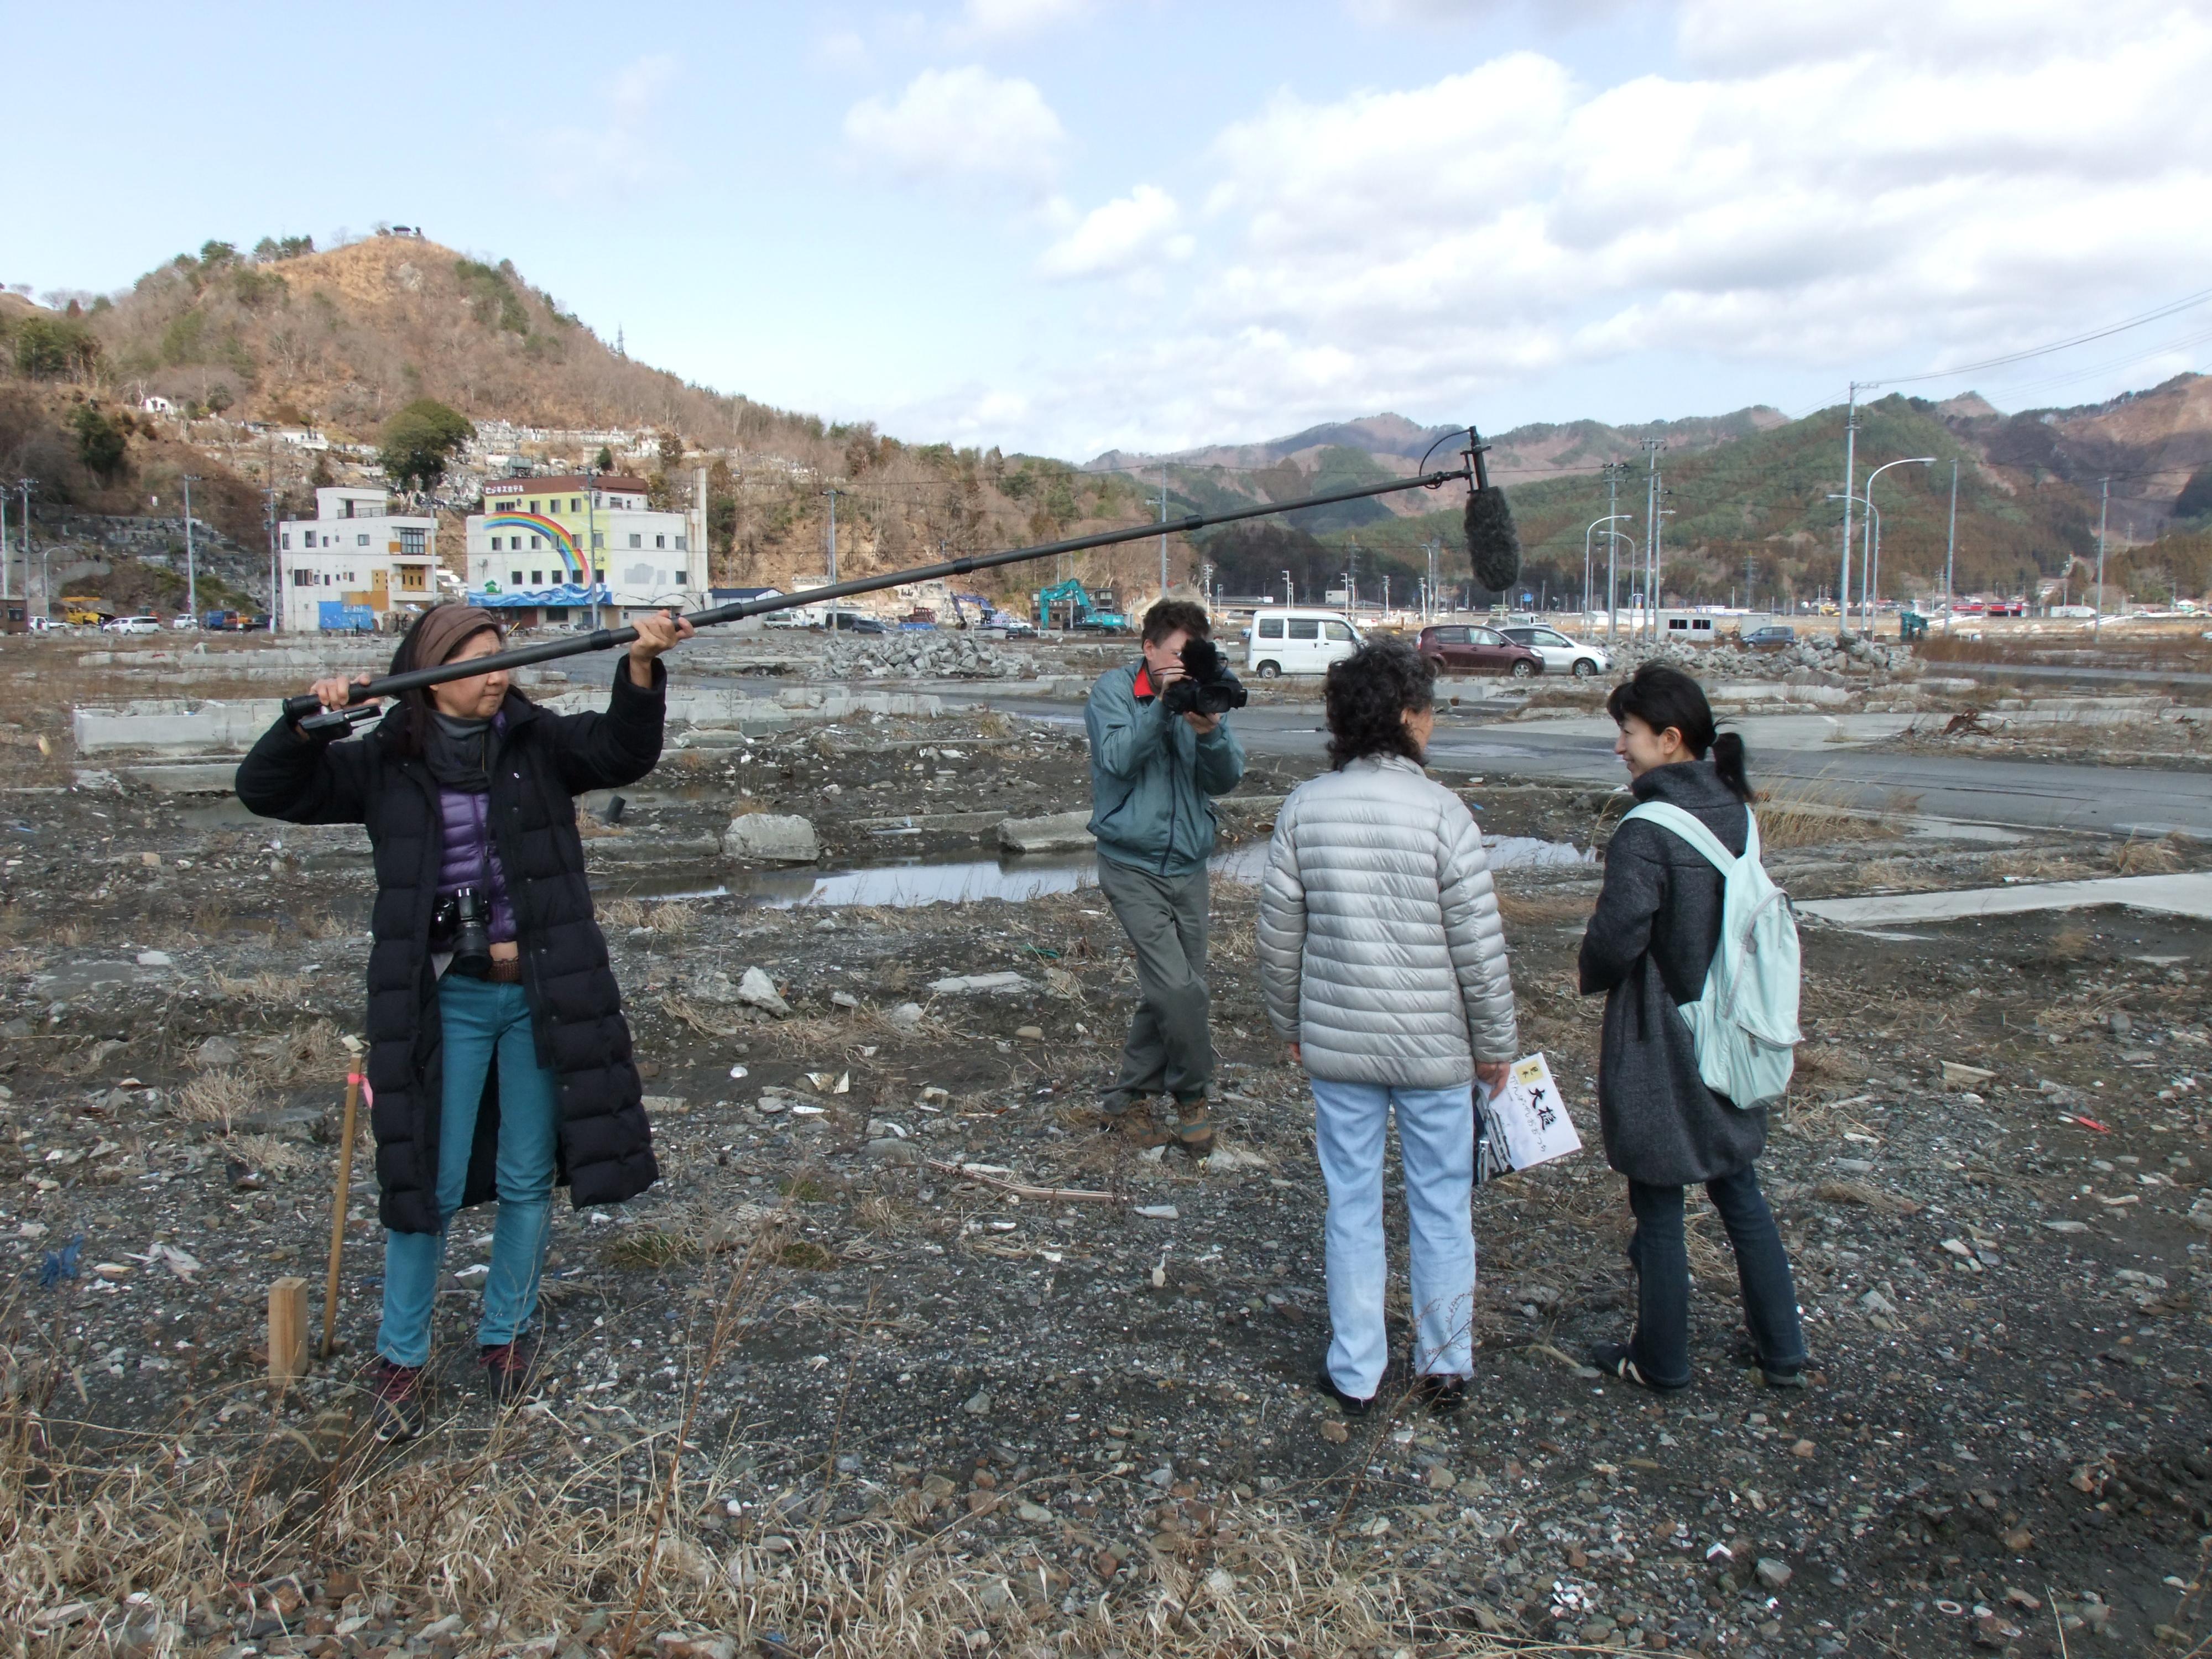 otsuchi linda boom man on debris kirk sakiko itto san interview.JPG